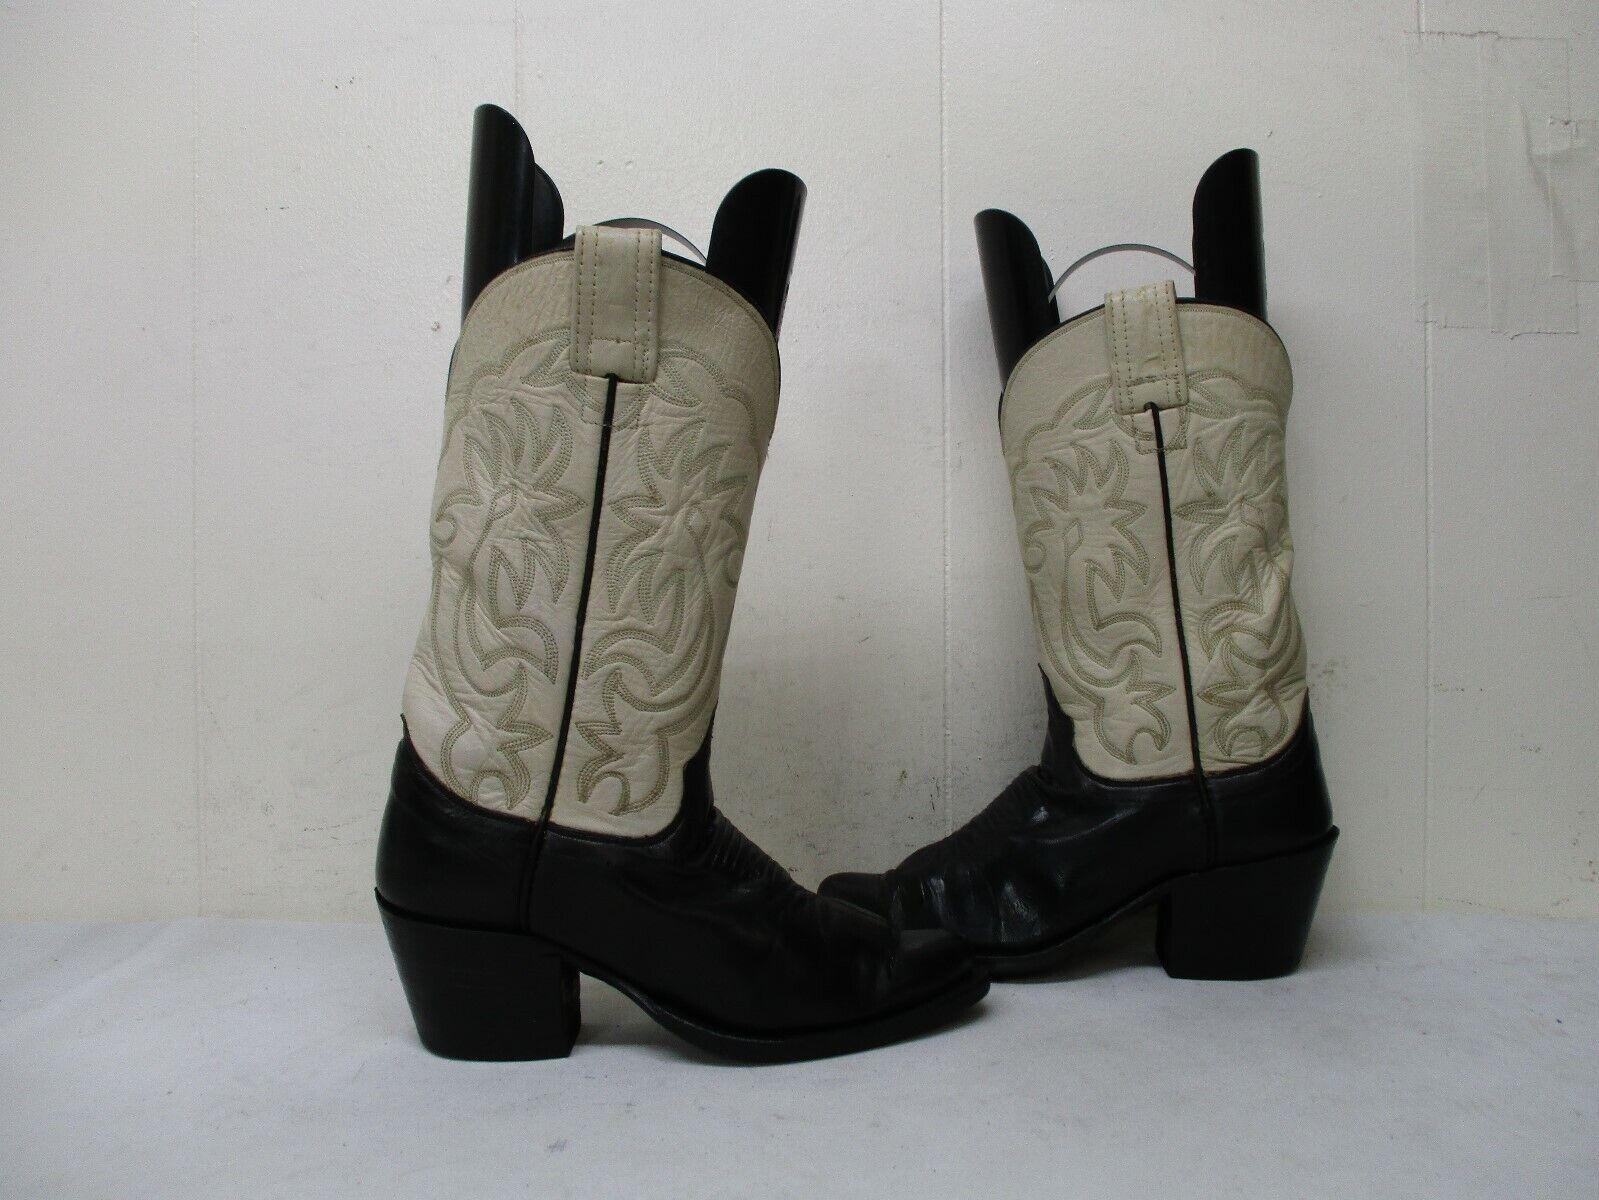 Olathe Negro de cuero crema botas de vaquero para mujer B Usa